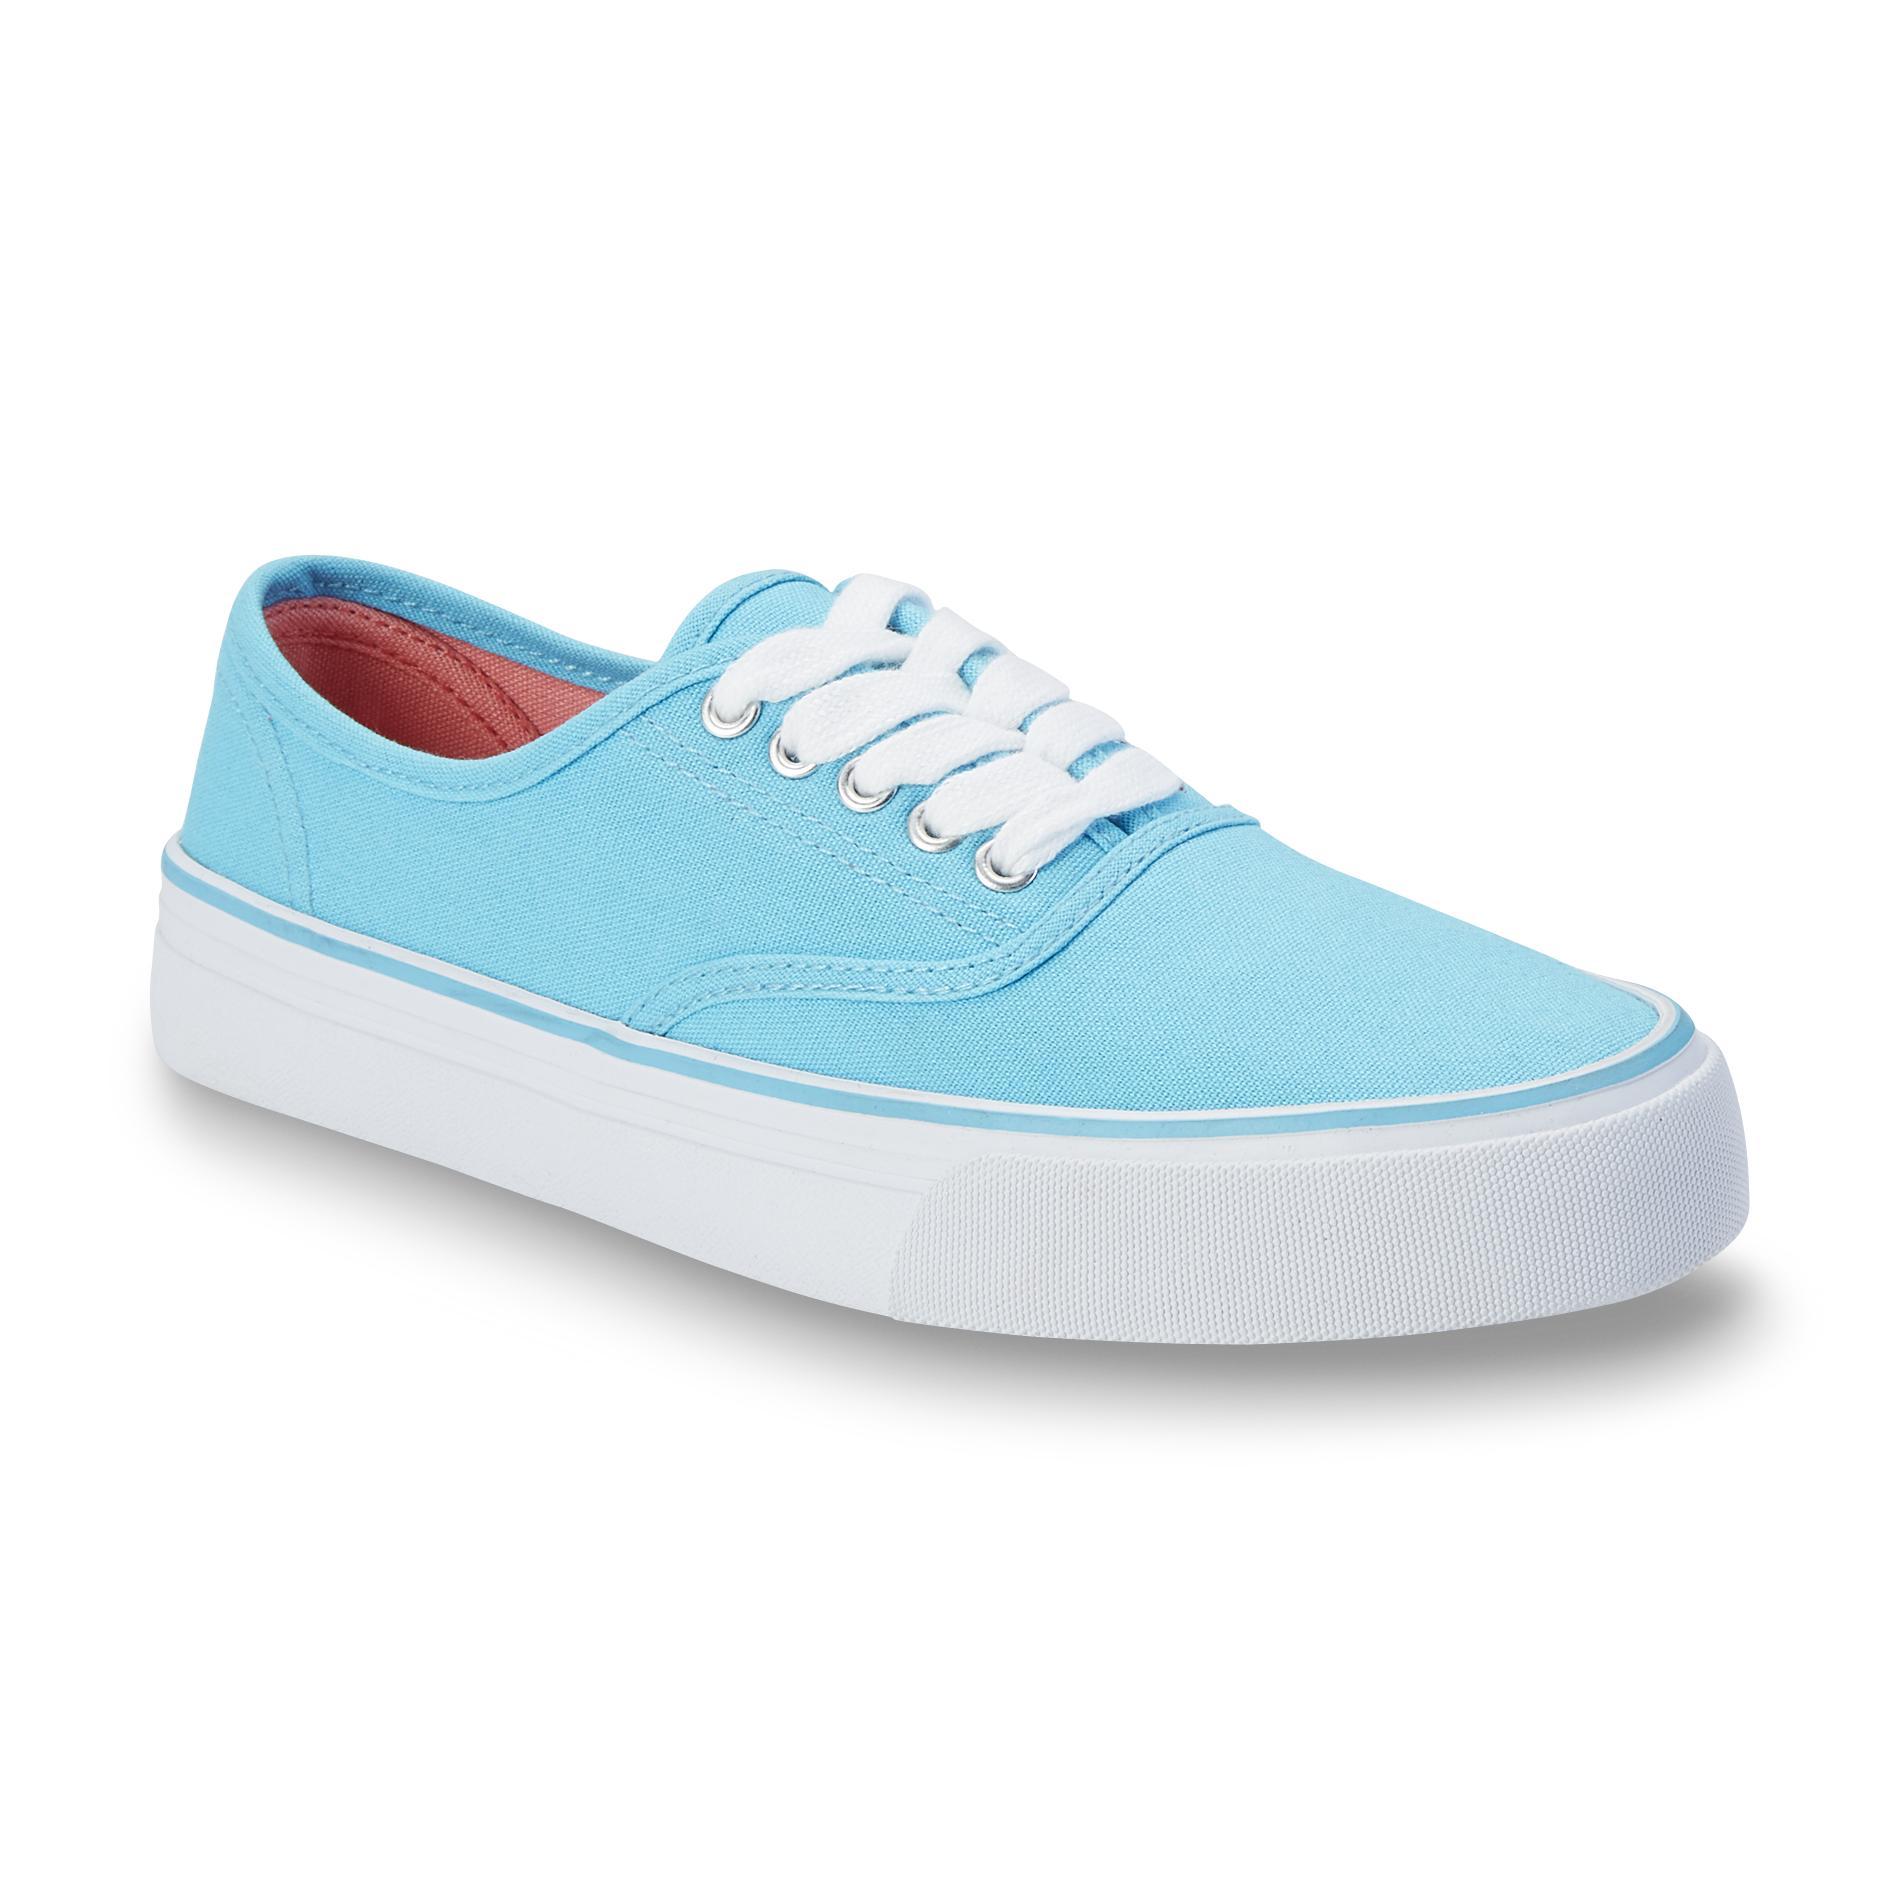 Joe Boxer Women's Sonoma Turquoise Sneaker